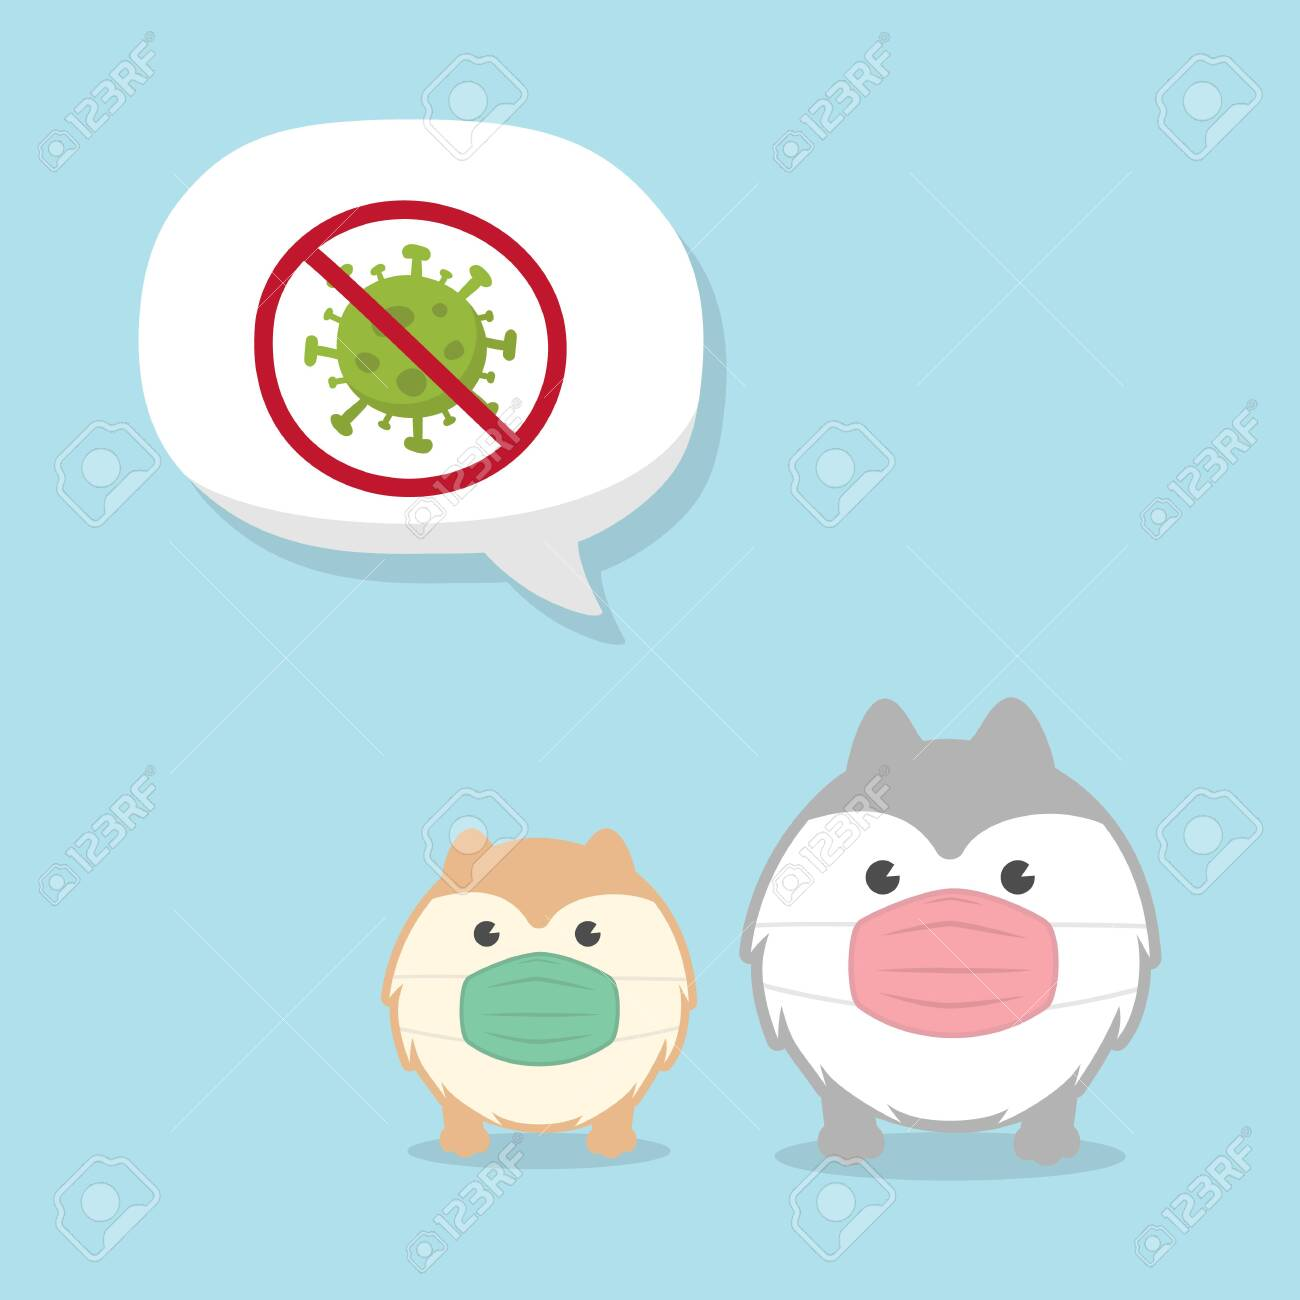 Cute Fluffy Dogs wearing medical mask. Coronavirus (COVID-19) Vector Illustration. - 144059256